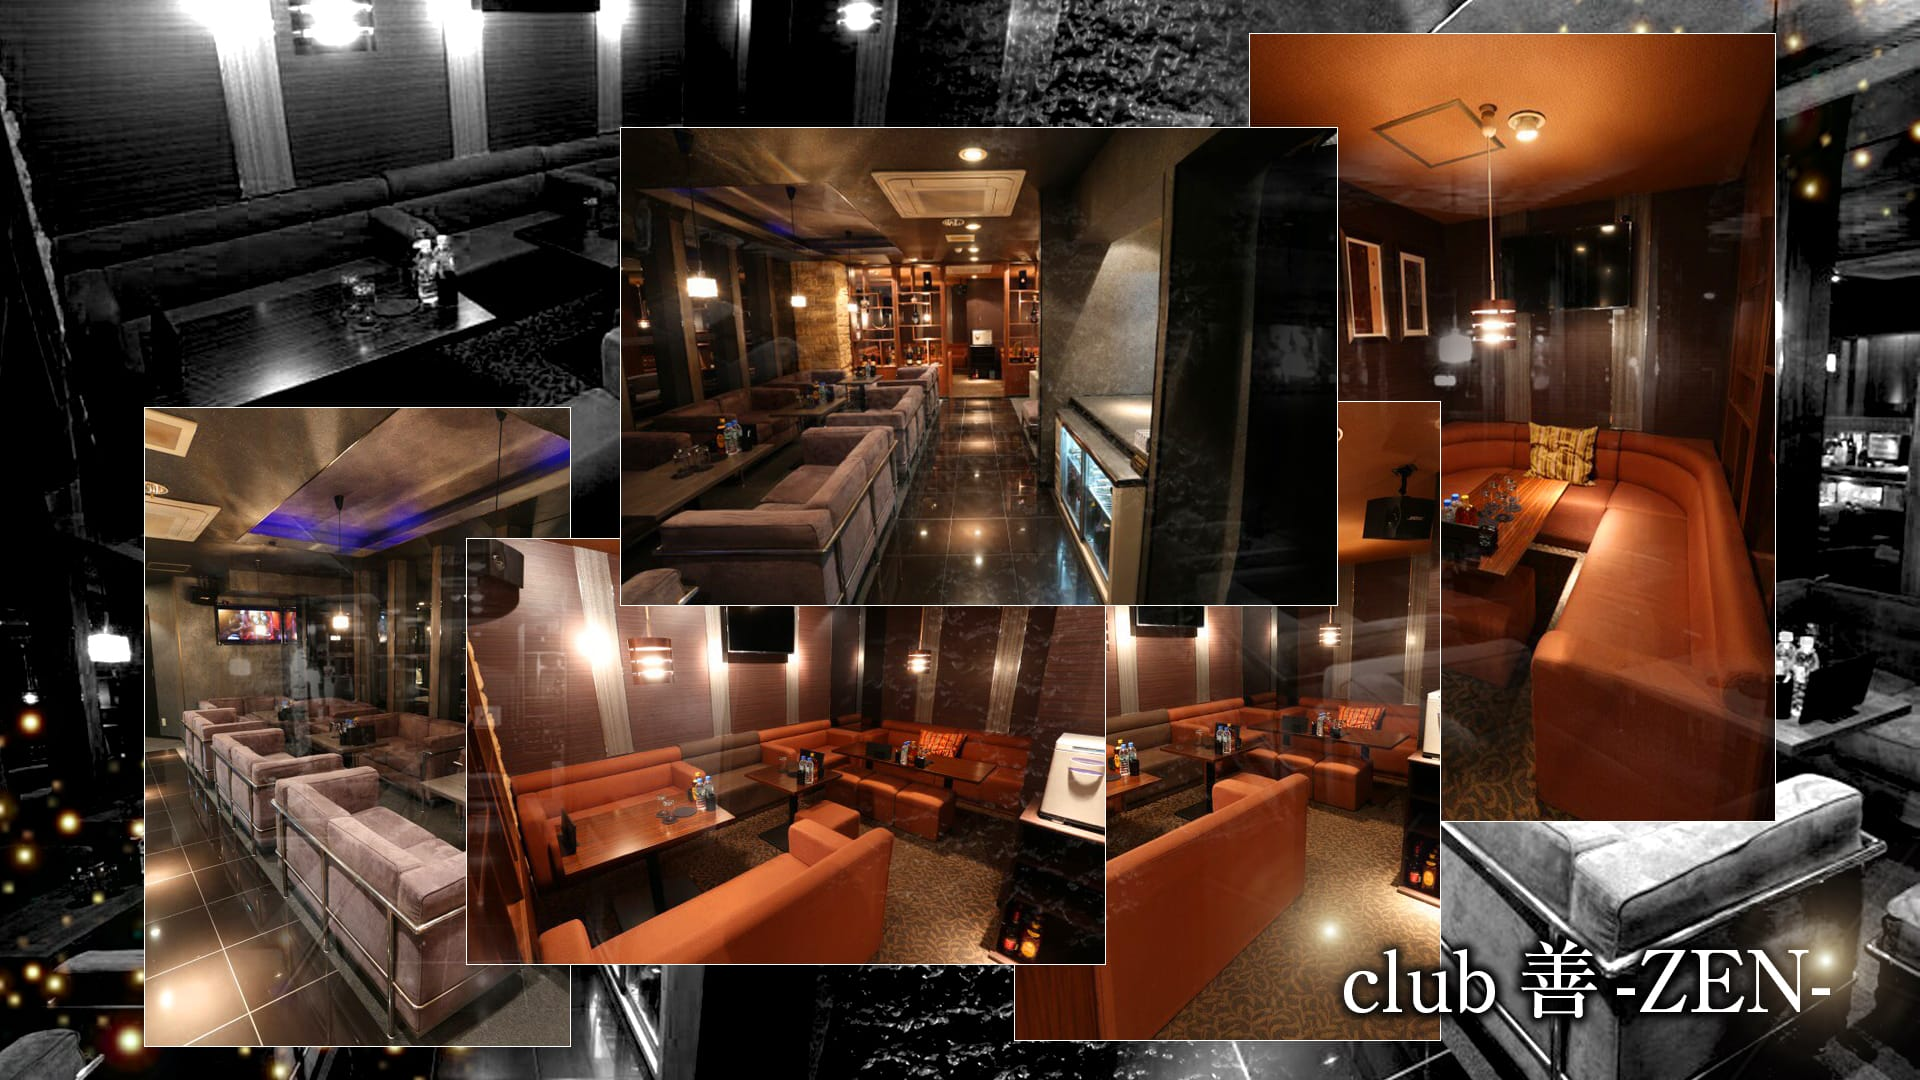 club 善-ZEN- 片町キャバクラ TOP画像